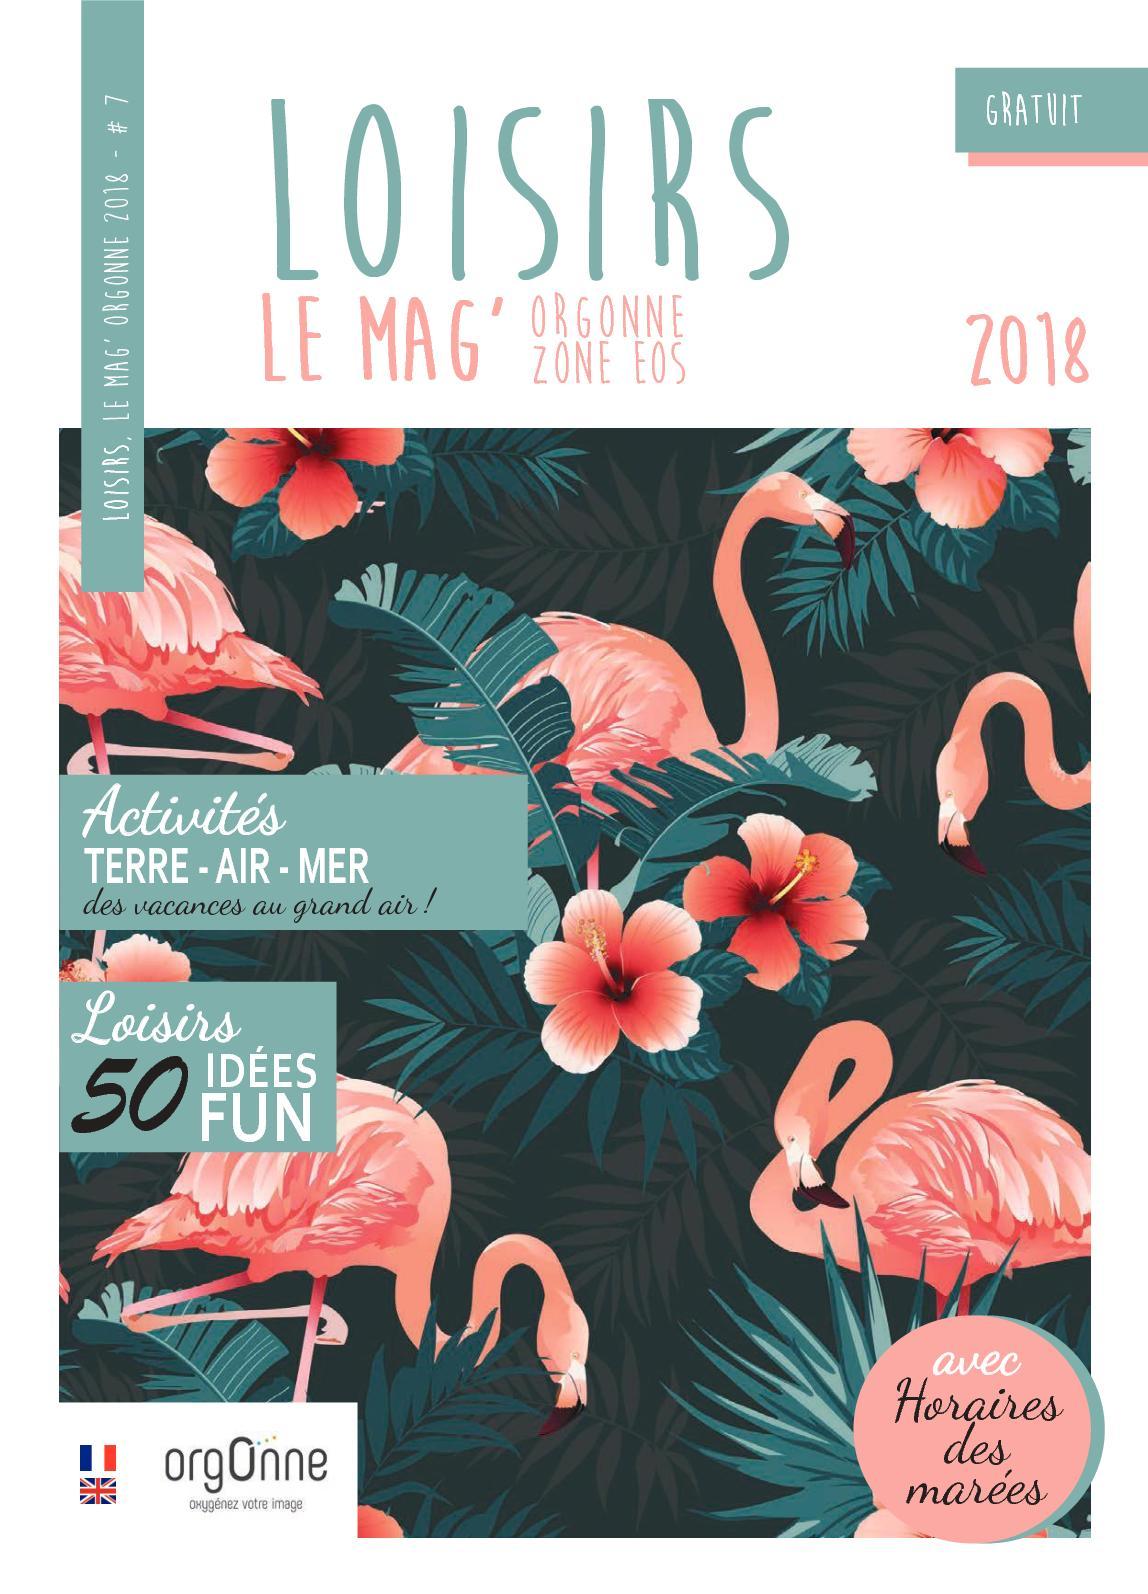 Mag'Loisirs 2018 Laetitia Vitaux